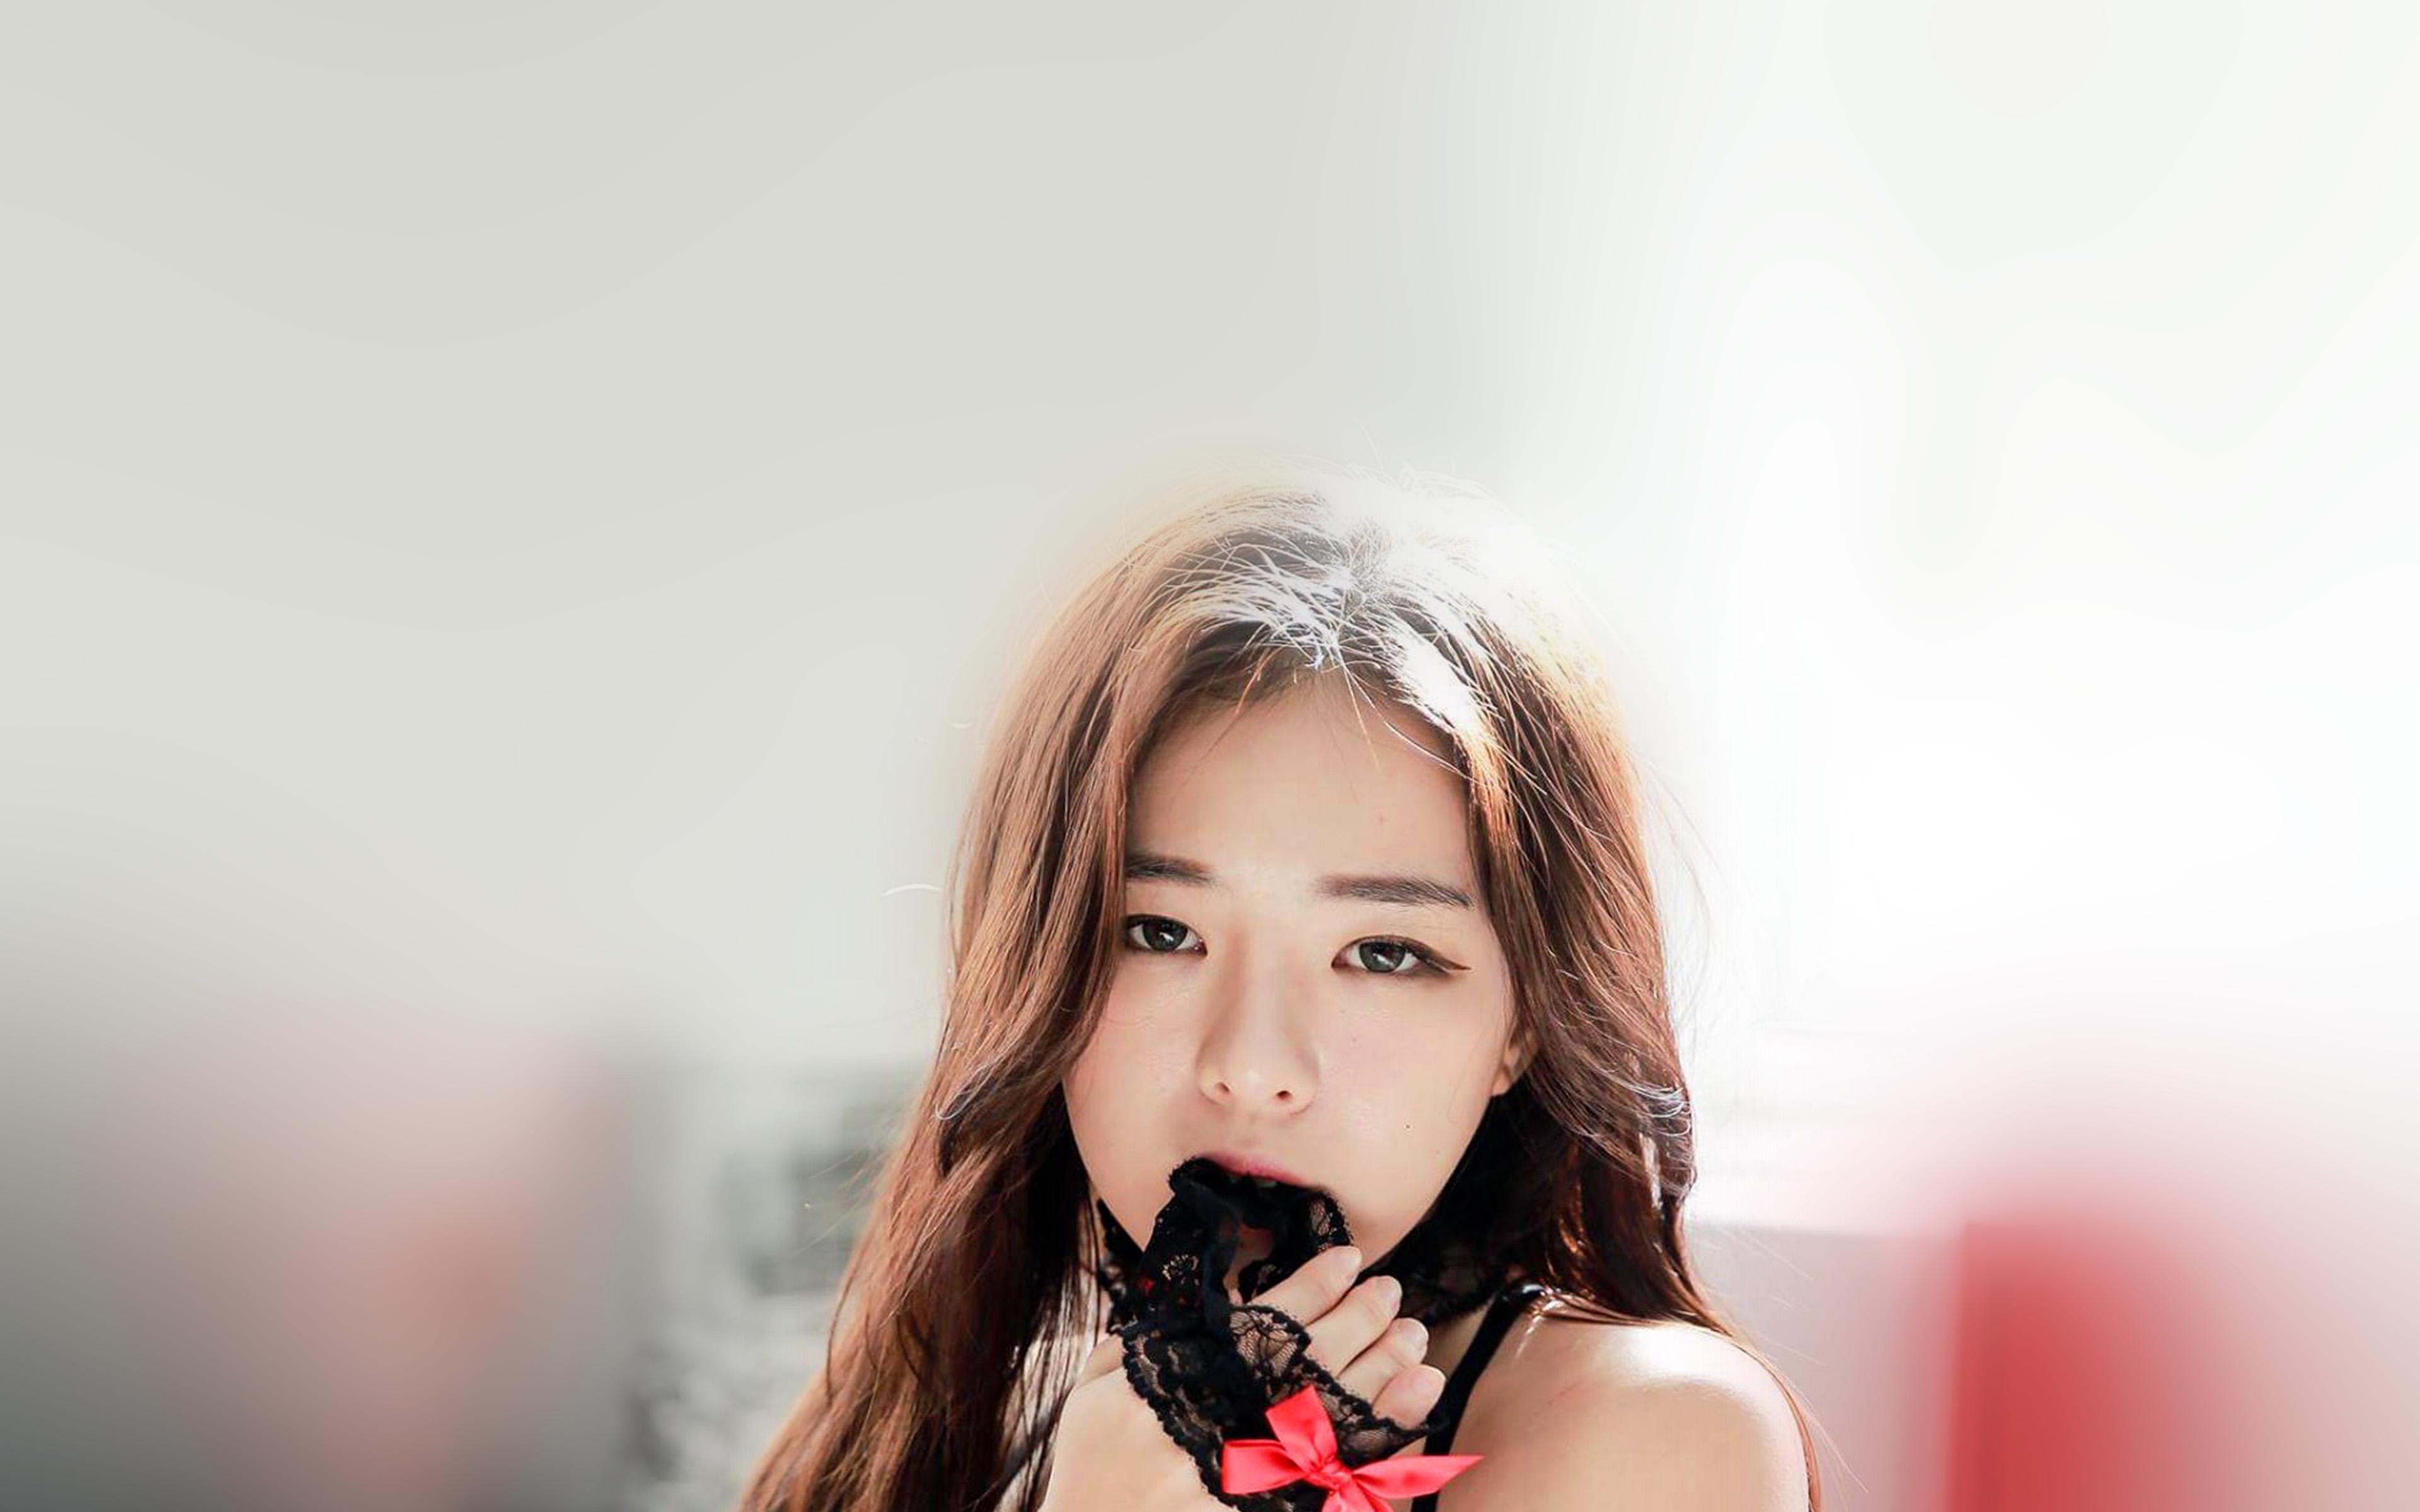 Wallpaper For Desktop Laptop Hh05 Haneul Girl Cute Model Kpop